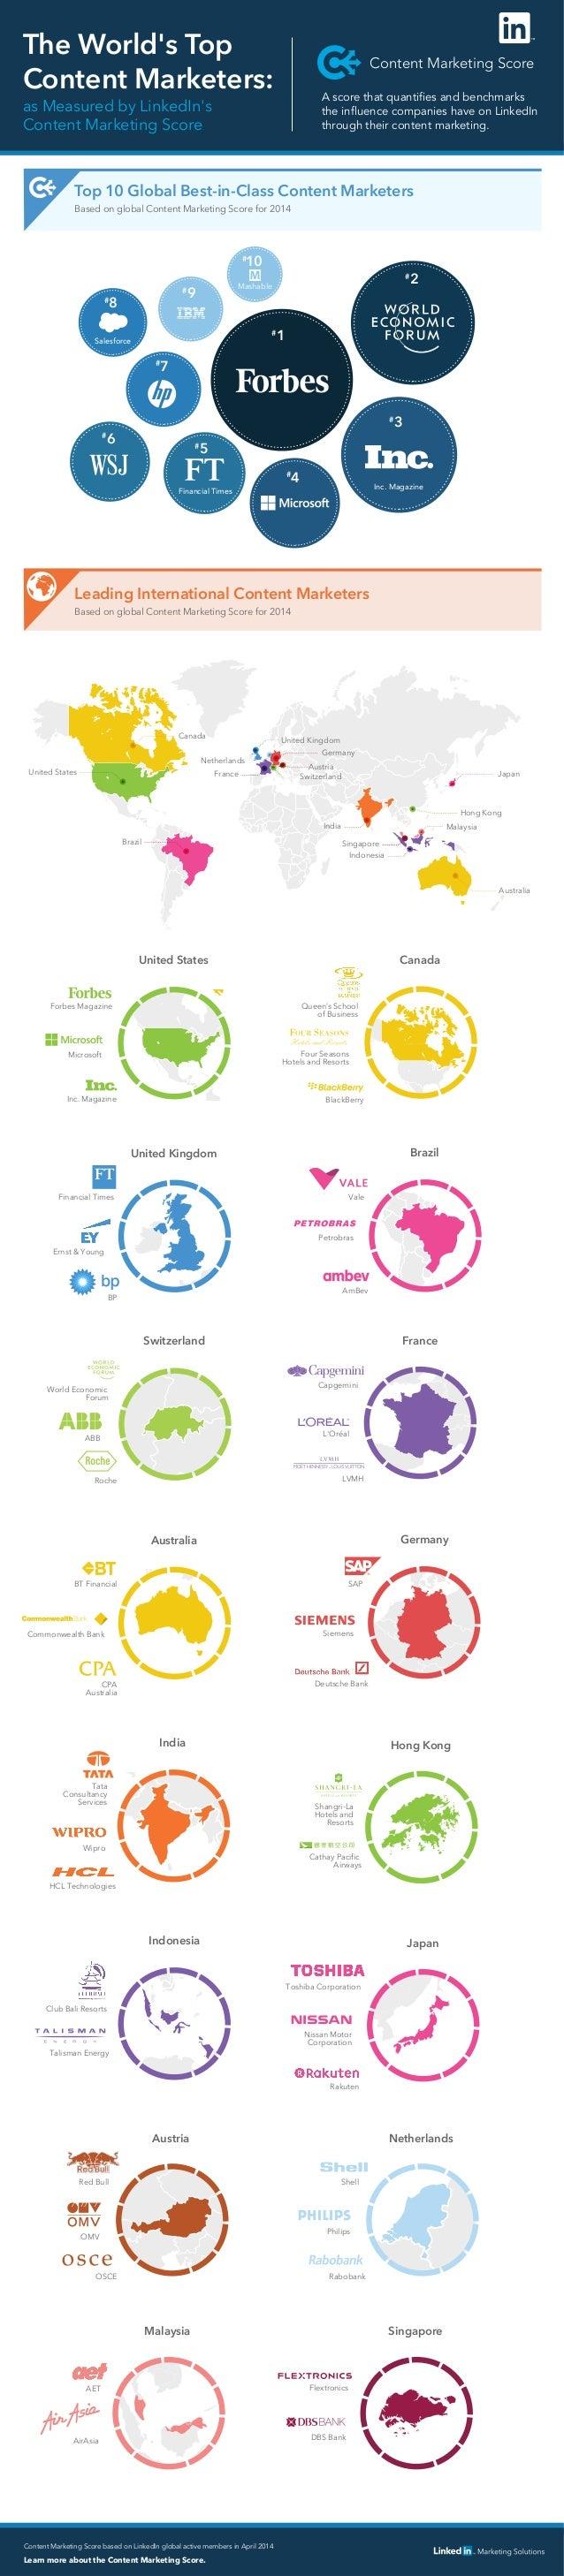 World Economic Forum Switzerland ABB Roche Content Marketing Score The World's Top Content Marketers: Top 10 Global Best-i...